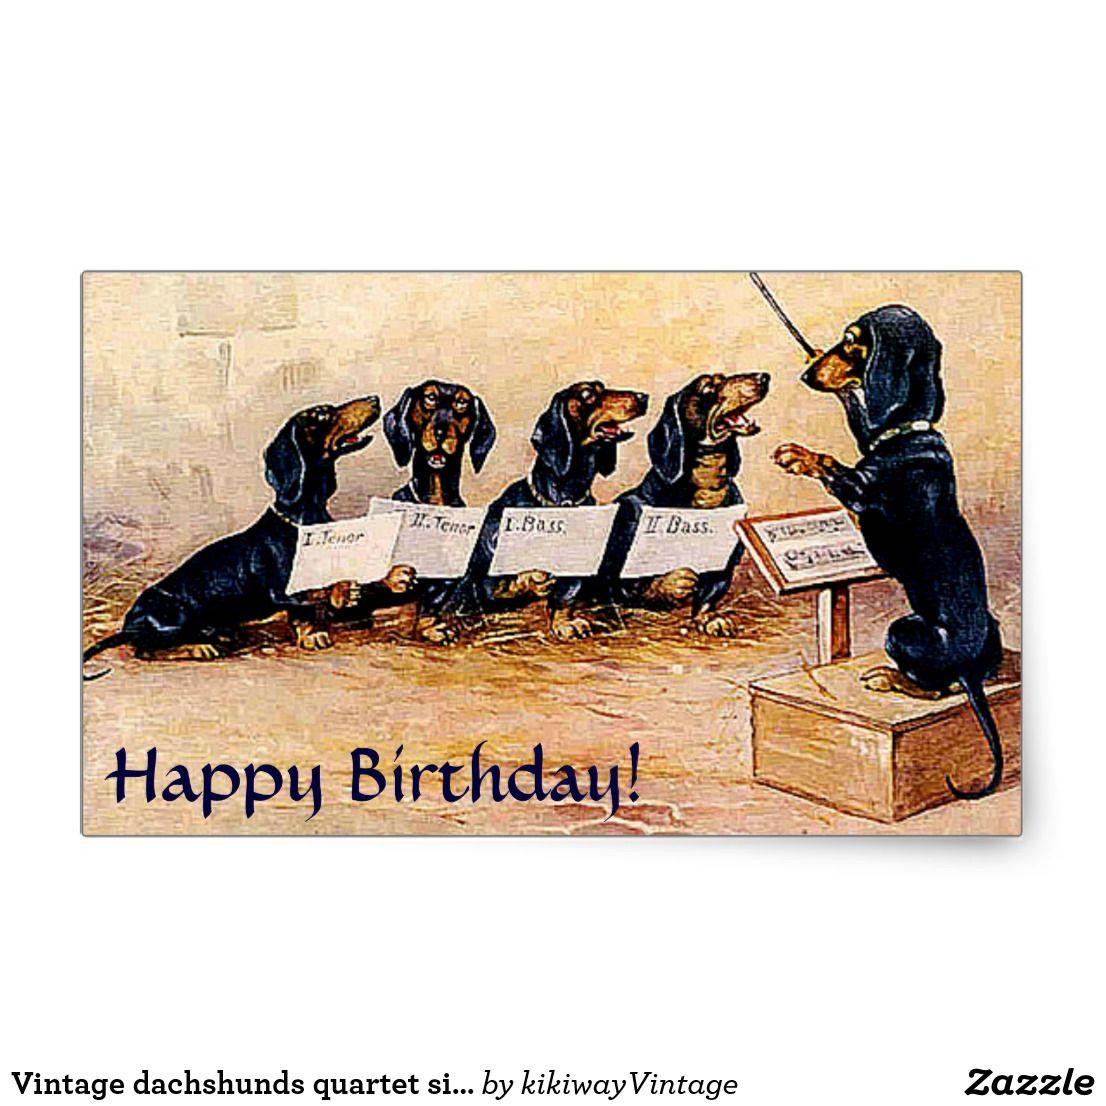 Vintage Dachshunds Quartet Singing Rectangular Sticker Zazzle